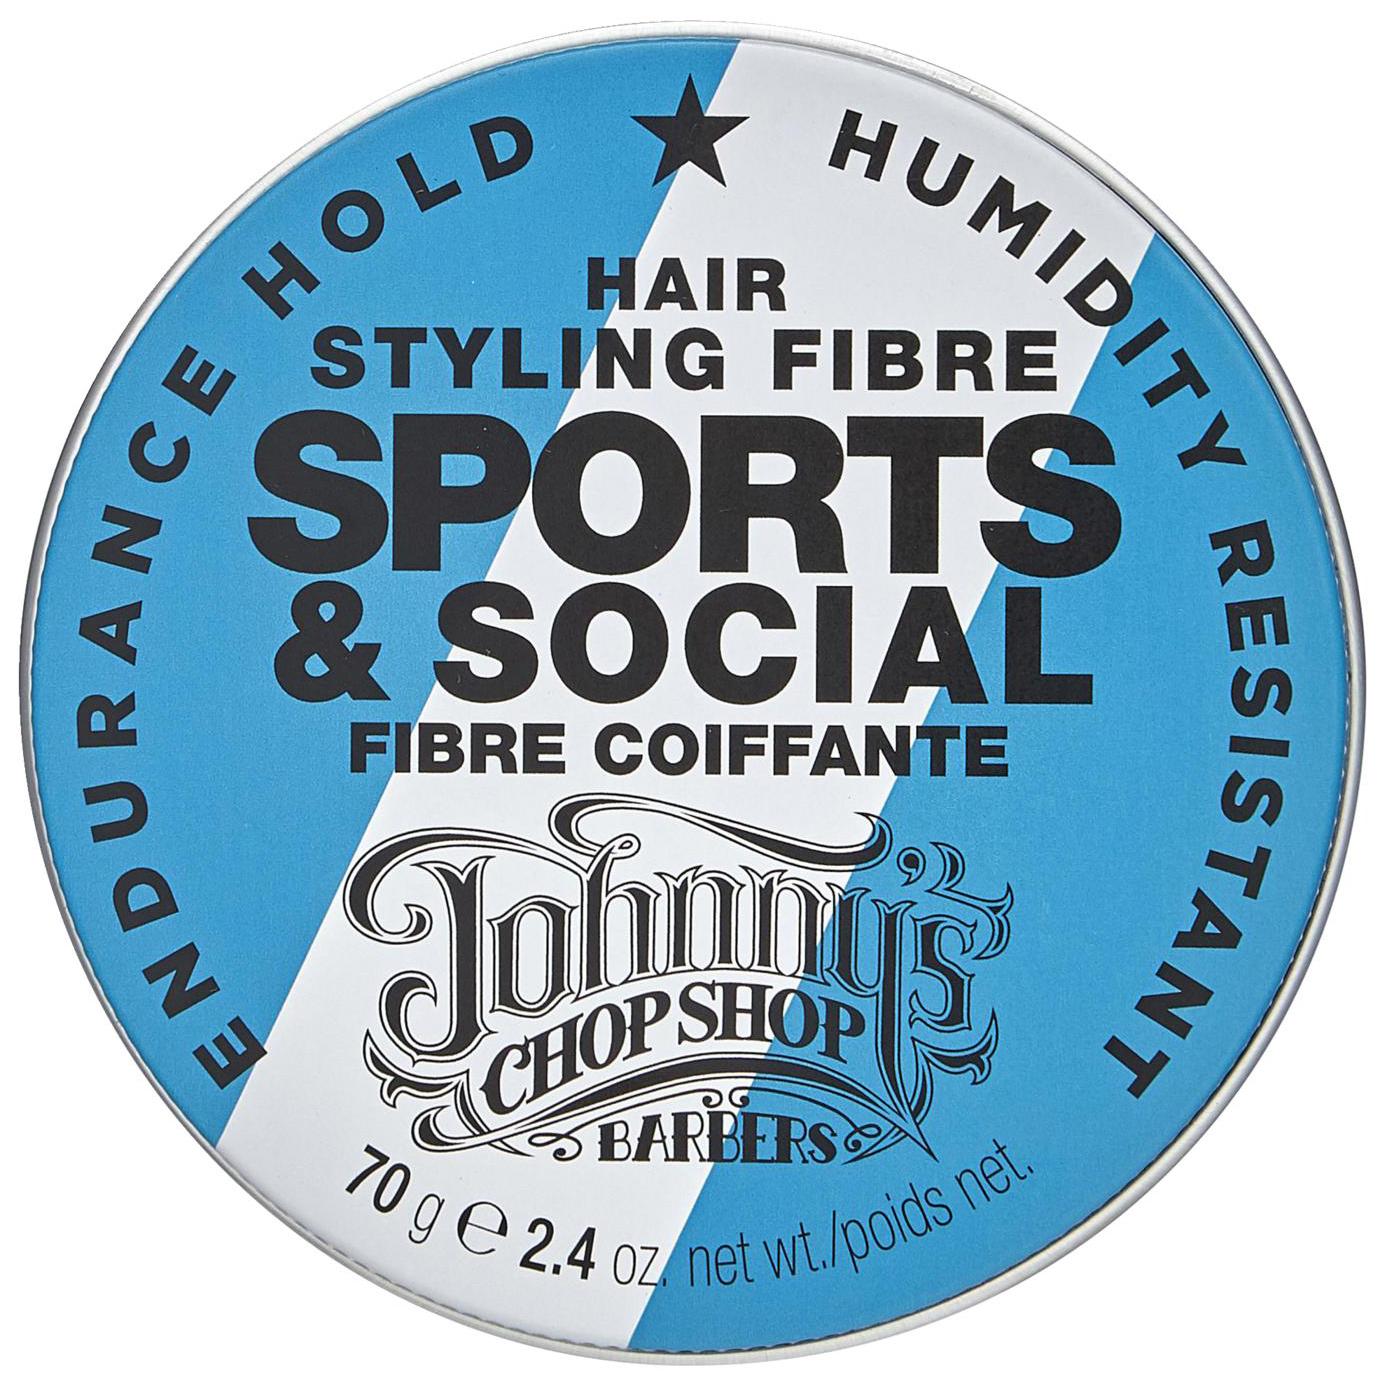 Средство для укладки волос Johnny's Chop Shop Sports & Social Hair Styling Fibre 70 г